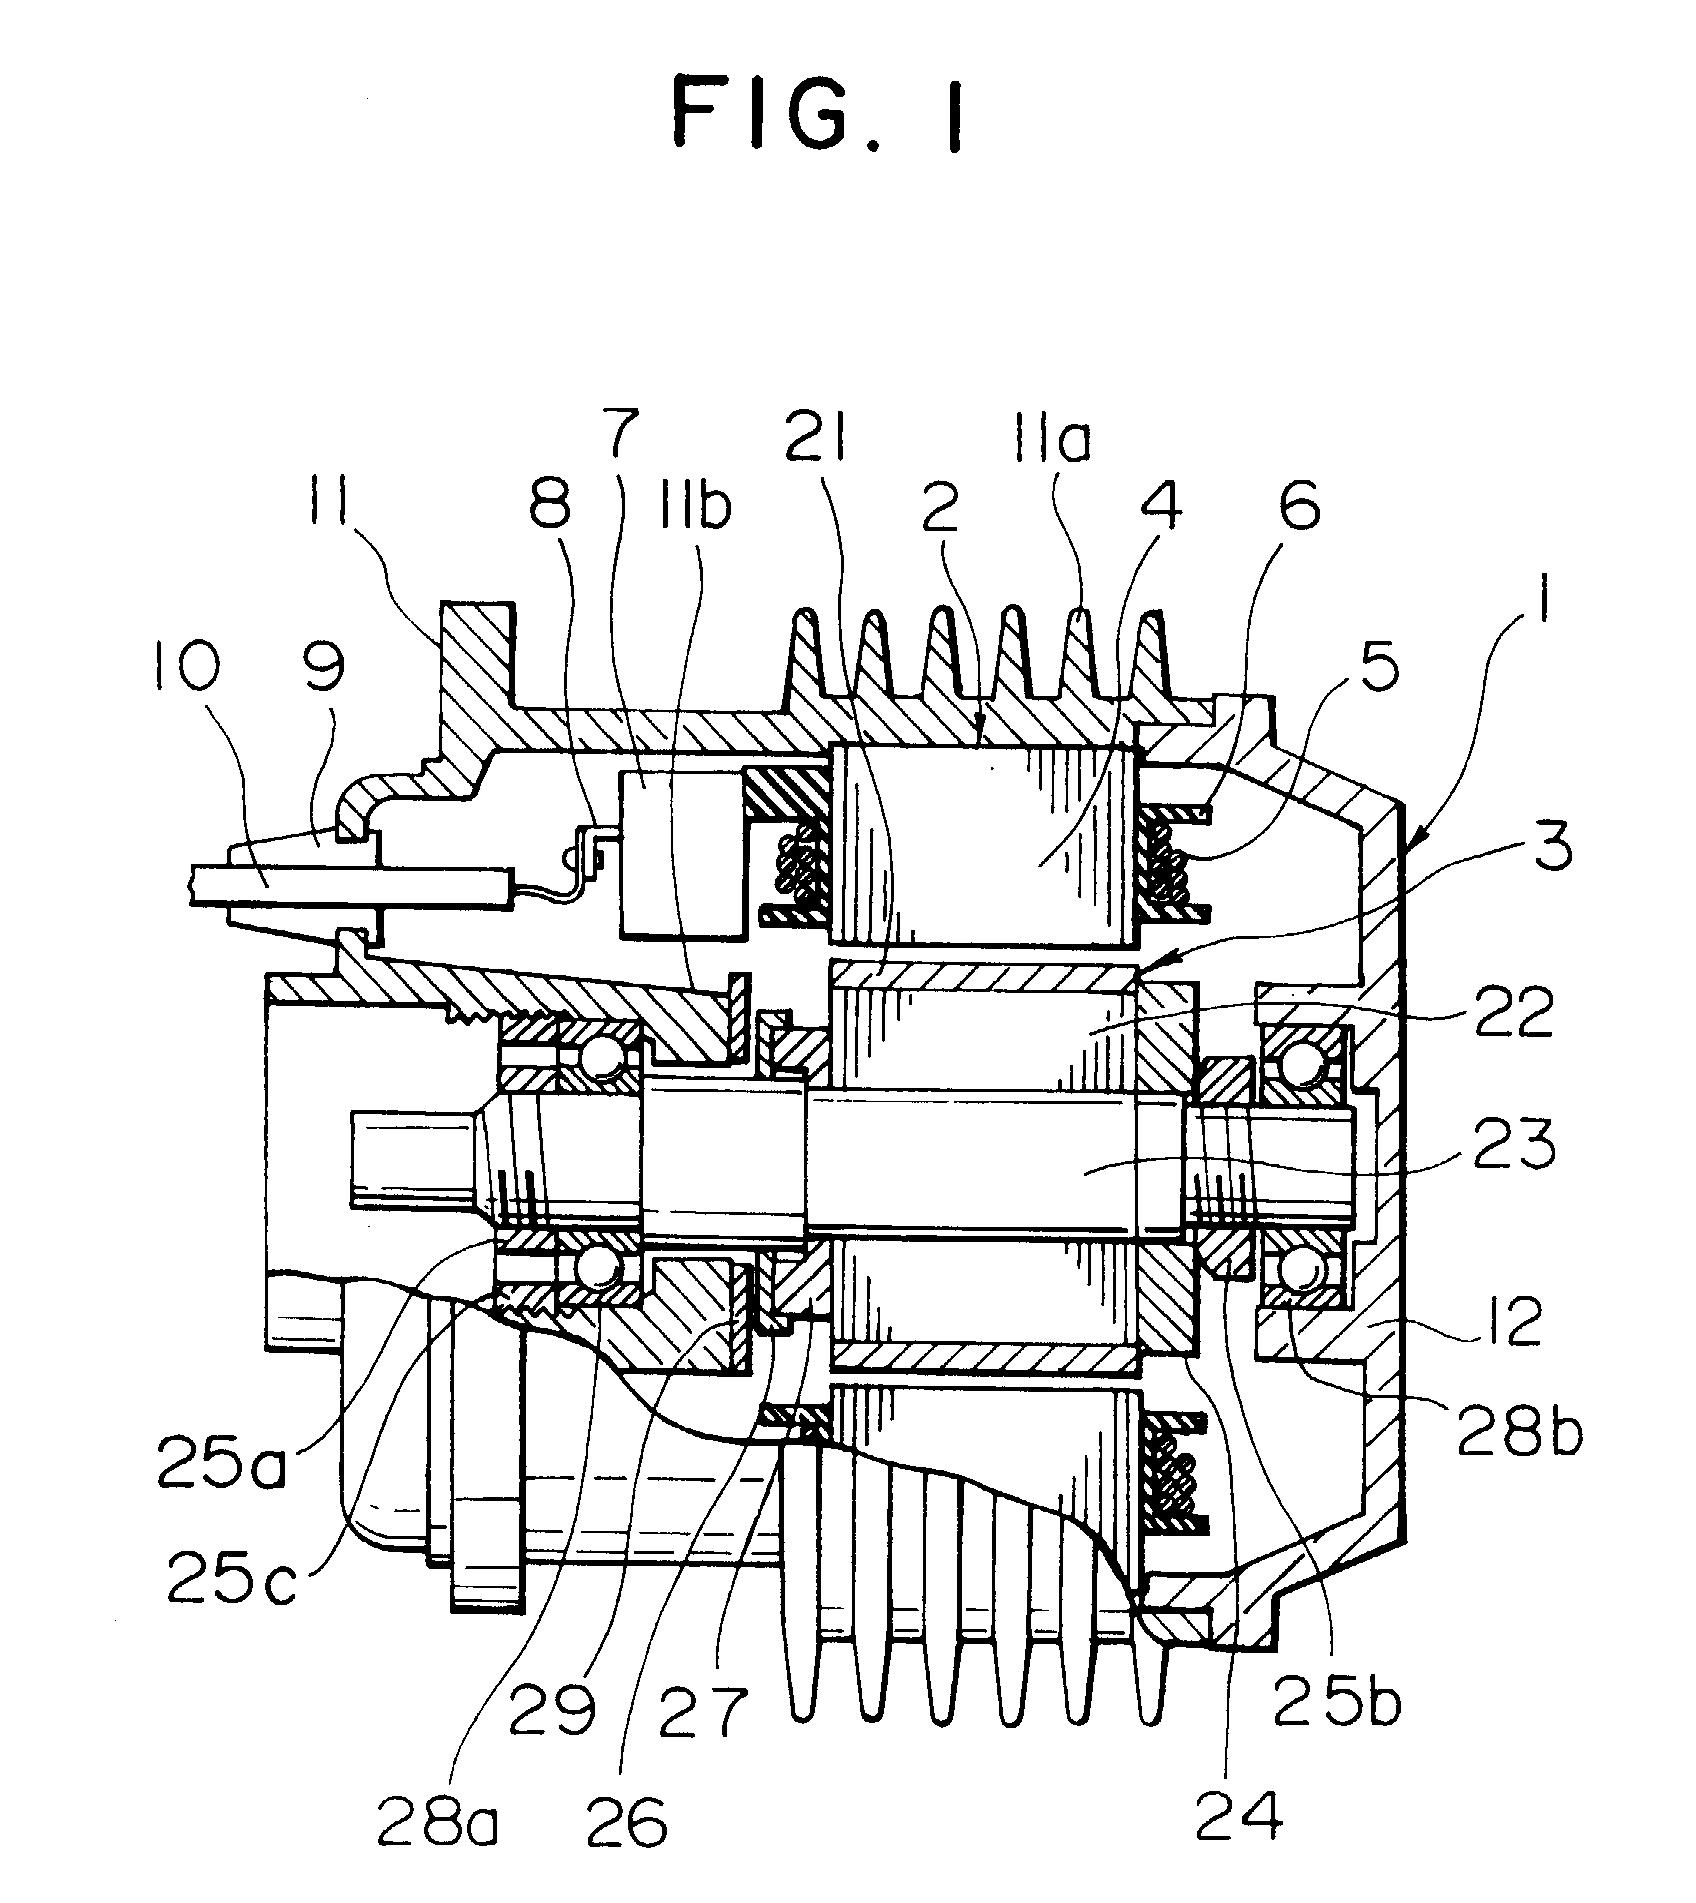 Vk 2730 Trx 300 Fourtrax Wiring Diagram For Free Diagram